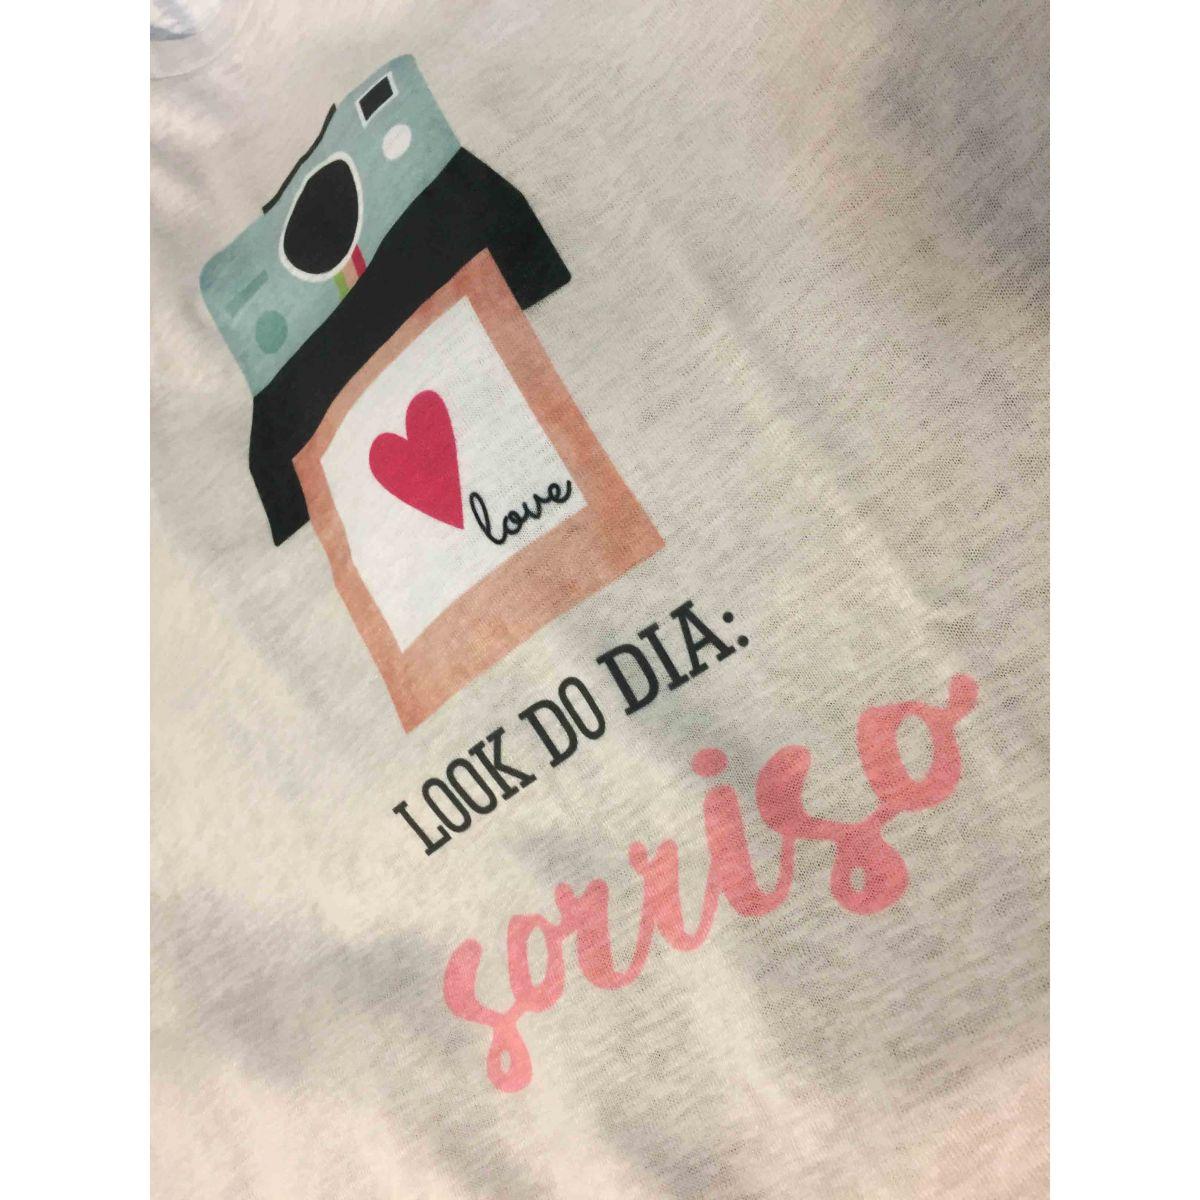 T-shirt Modelo Polaroid Love - Coleção Picnic / JuJu Scrapbook  - JuJu Scrapbook